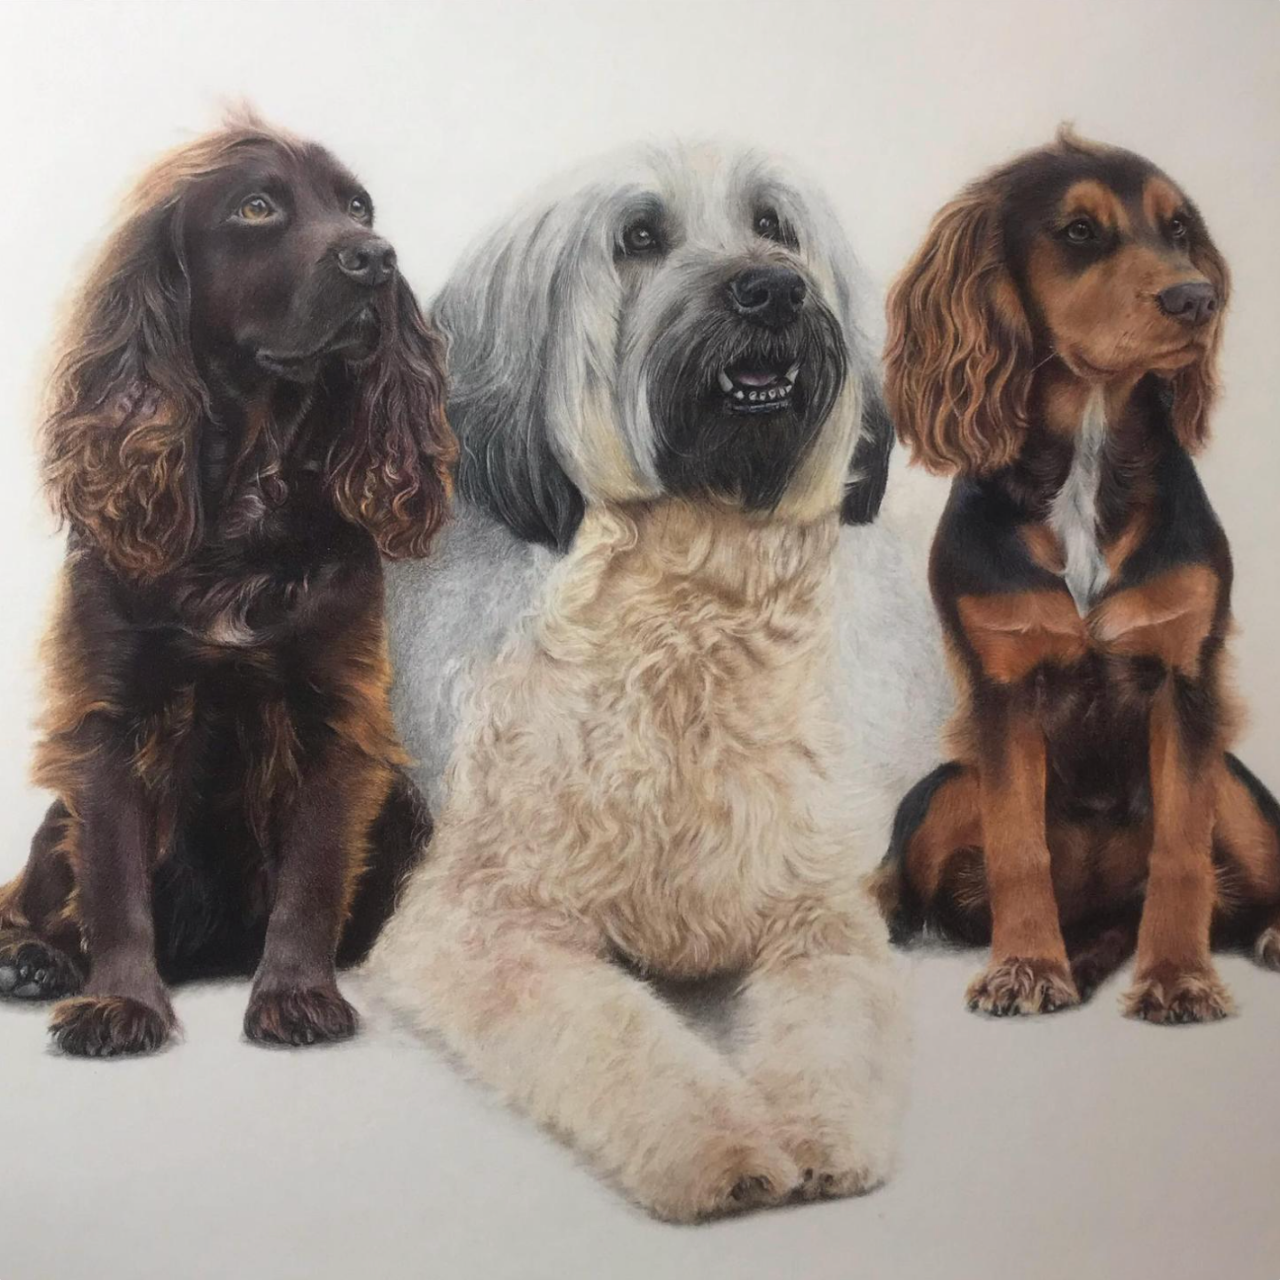 Three Dogs - Coloured Pencil Drawing - Bonny Snowdon Fine Art